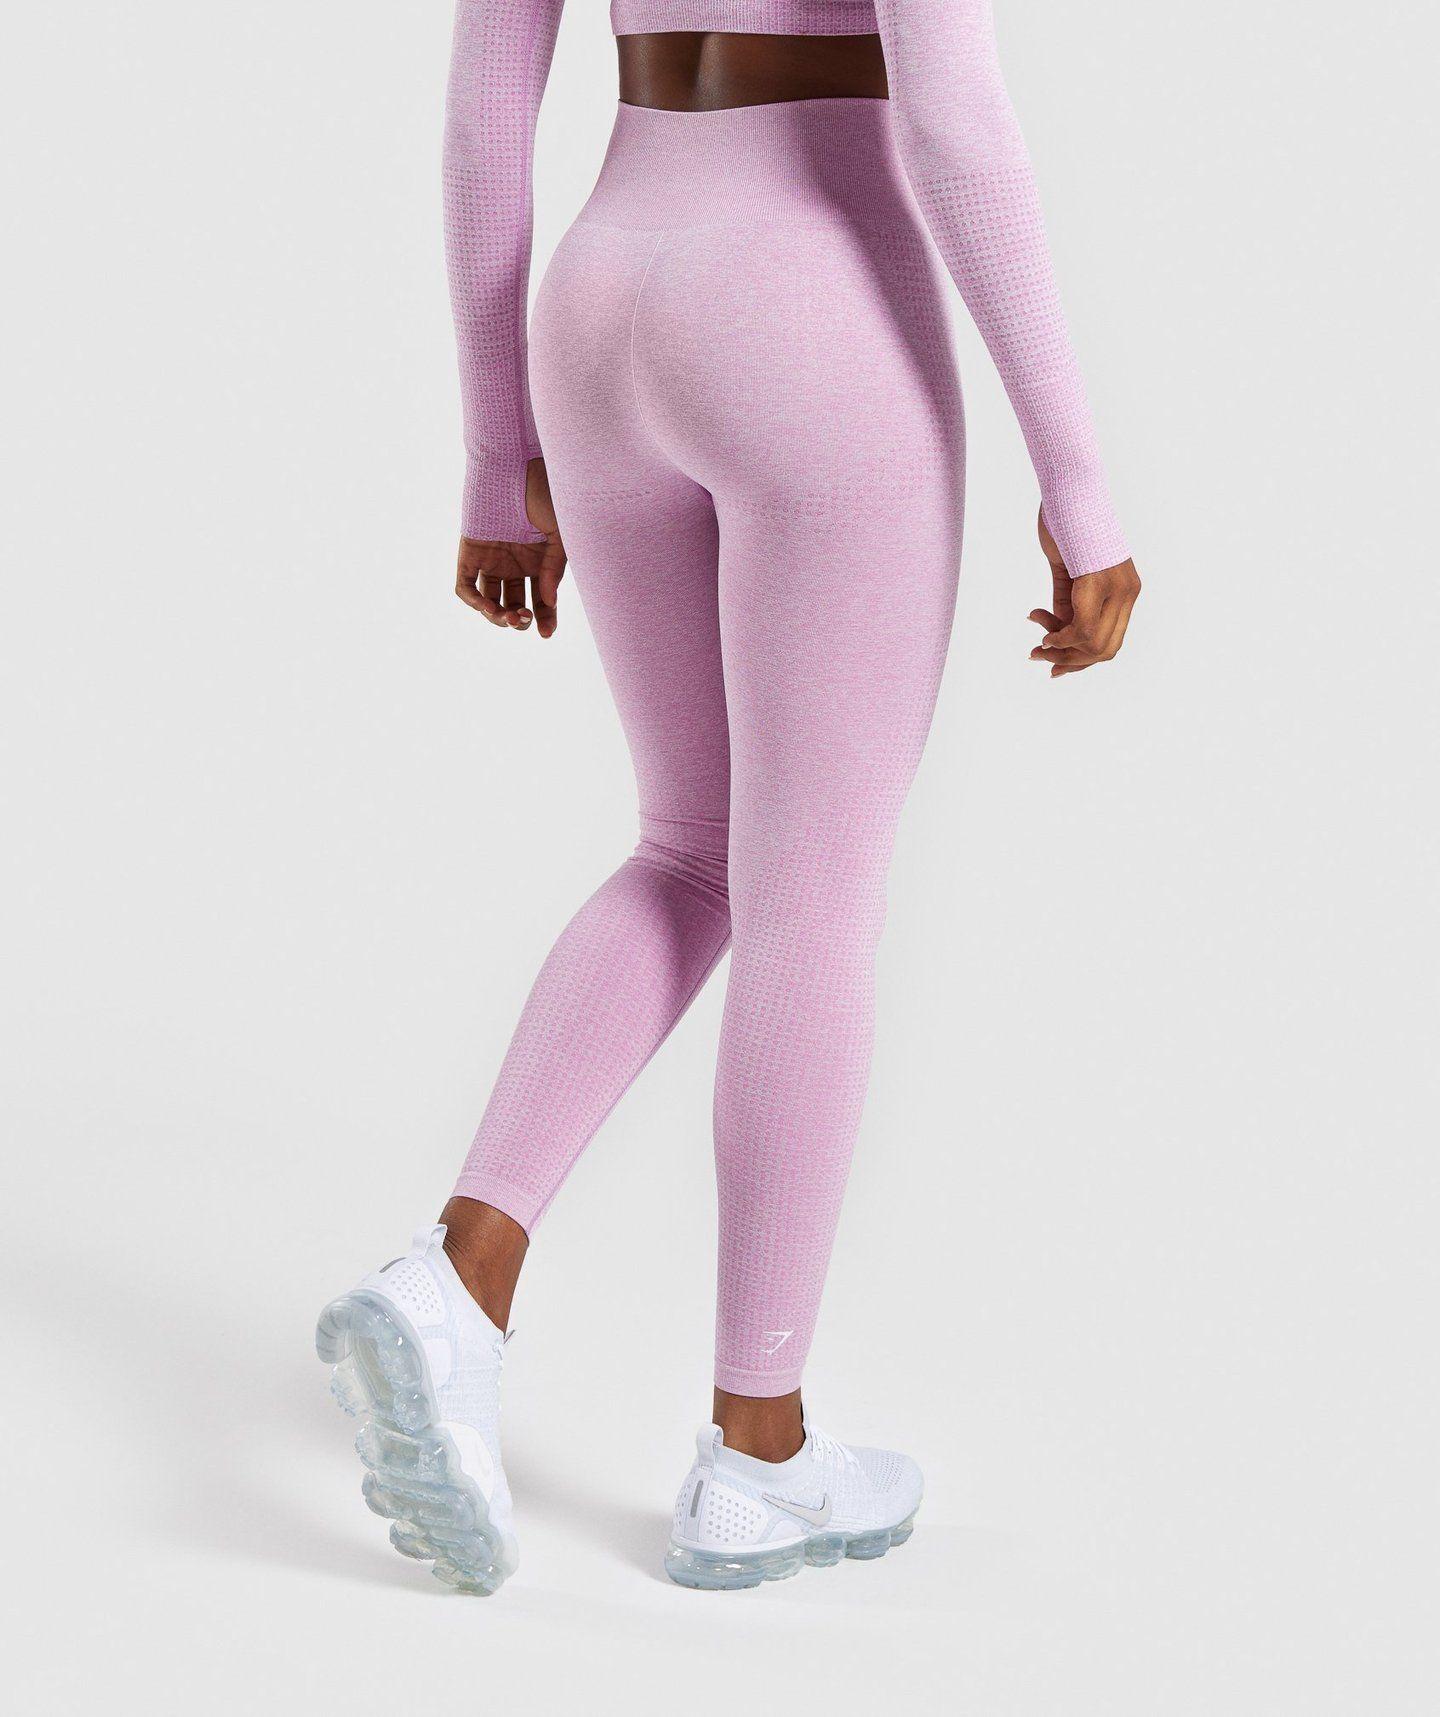 33dd11ea094 Gymshark Vital Seamless Leggings - Pink 1 Seamless Leggings, Pink Leggings,  High Socks,